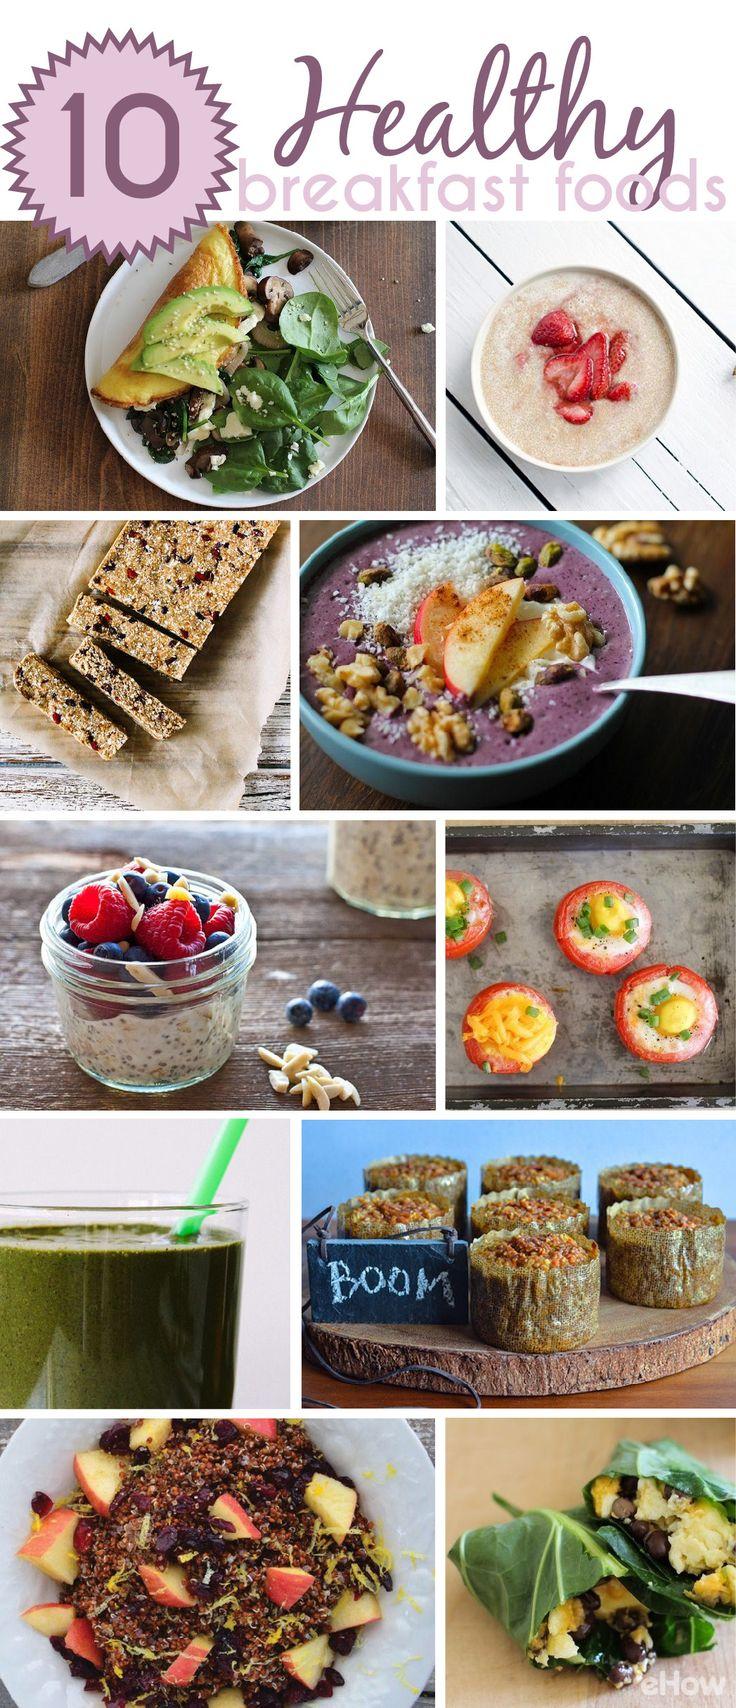 how to make good breakfast foods